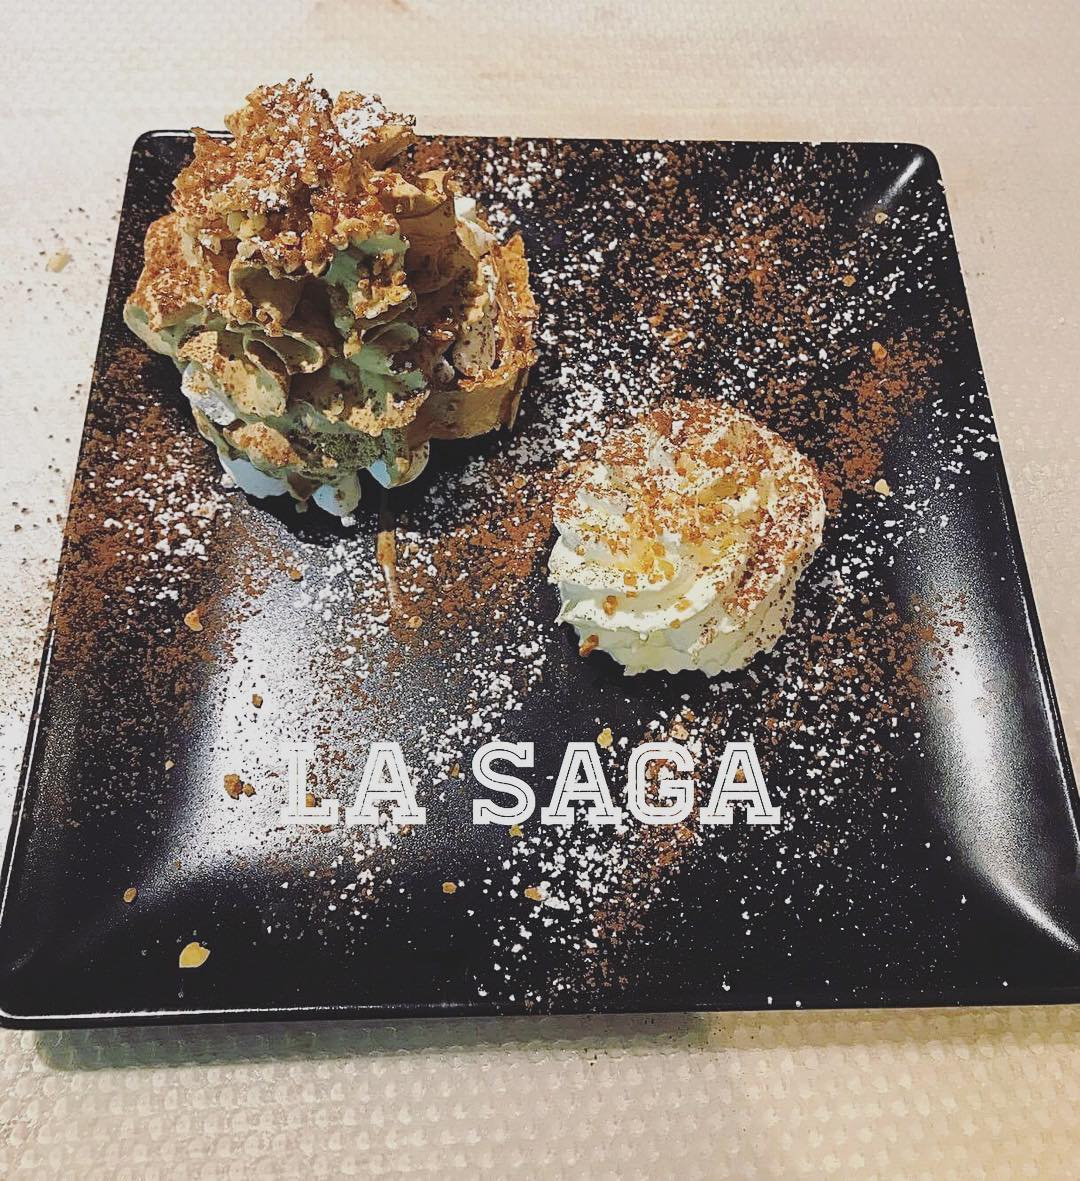 chanteclair-restaurant-pizzeria-la-saga-carqueiranne